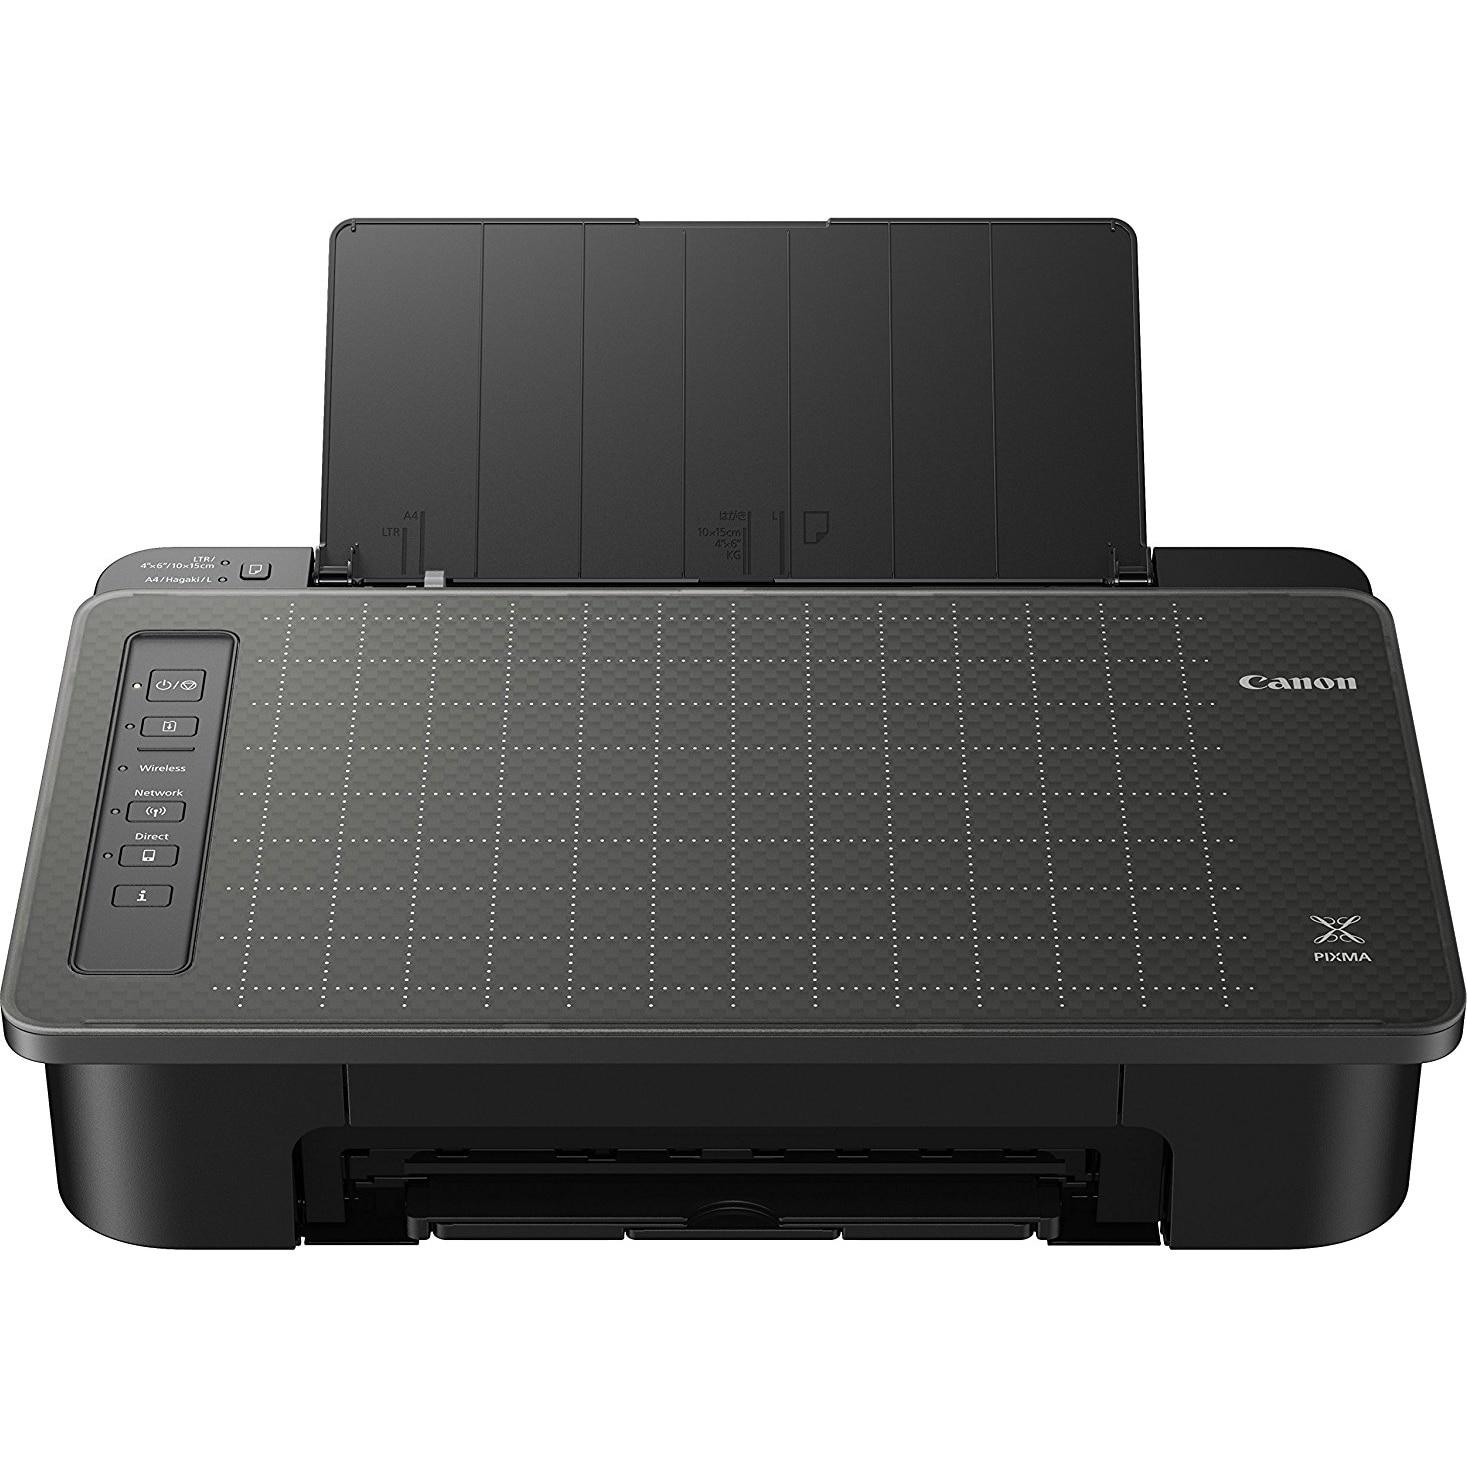 Fotografie Imprimanta inkjet color Canon PIXMA TS305, A4, Negru